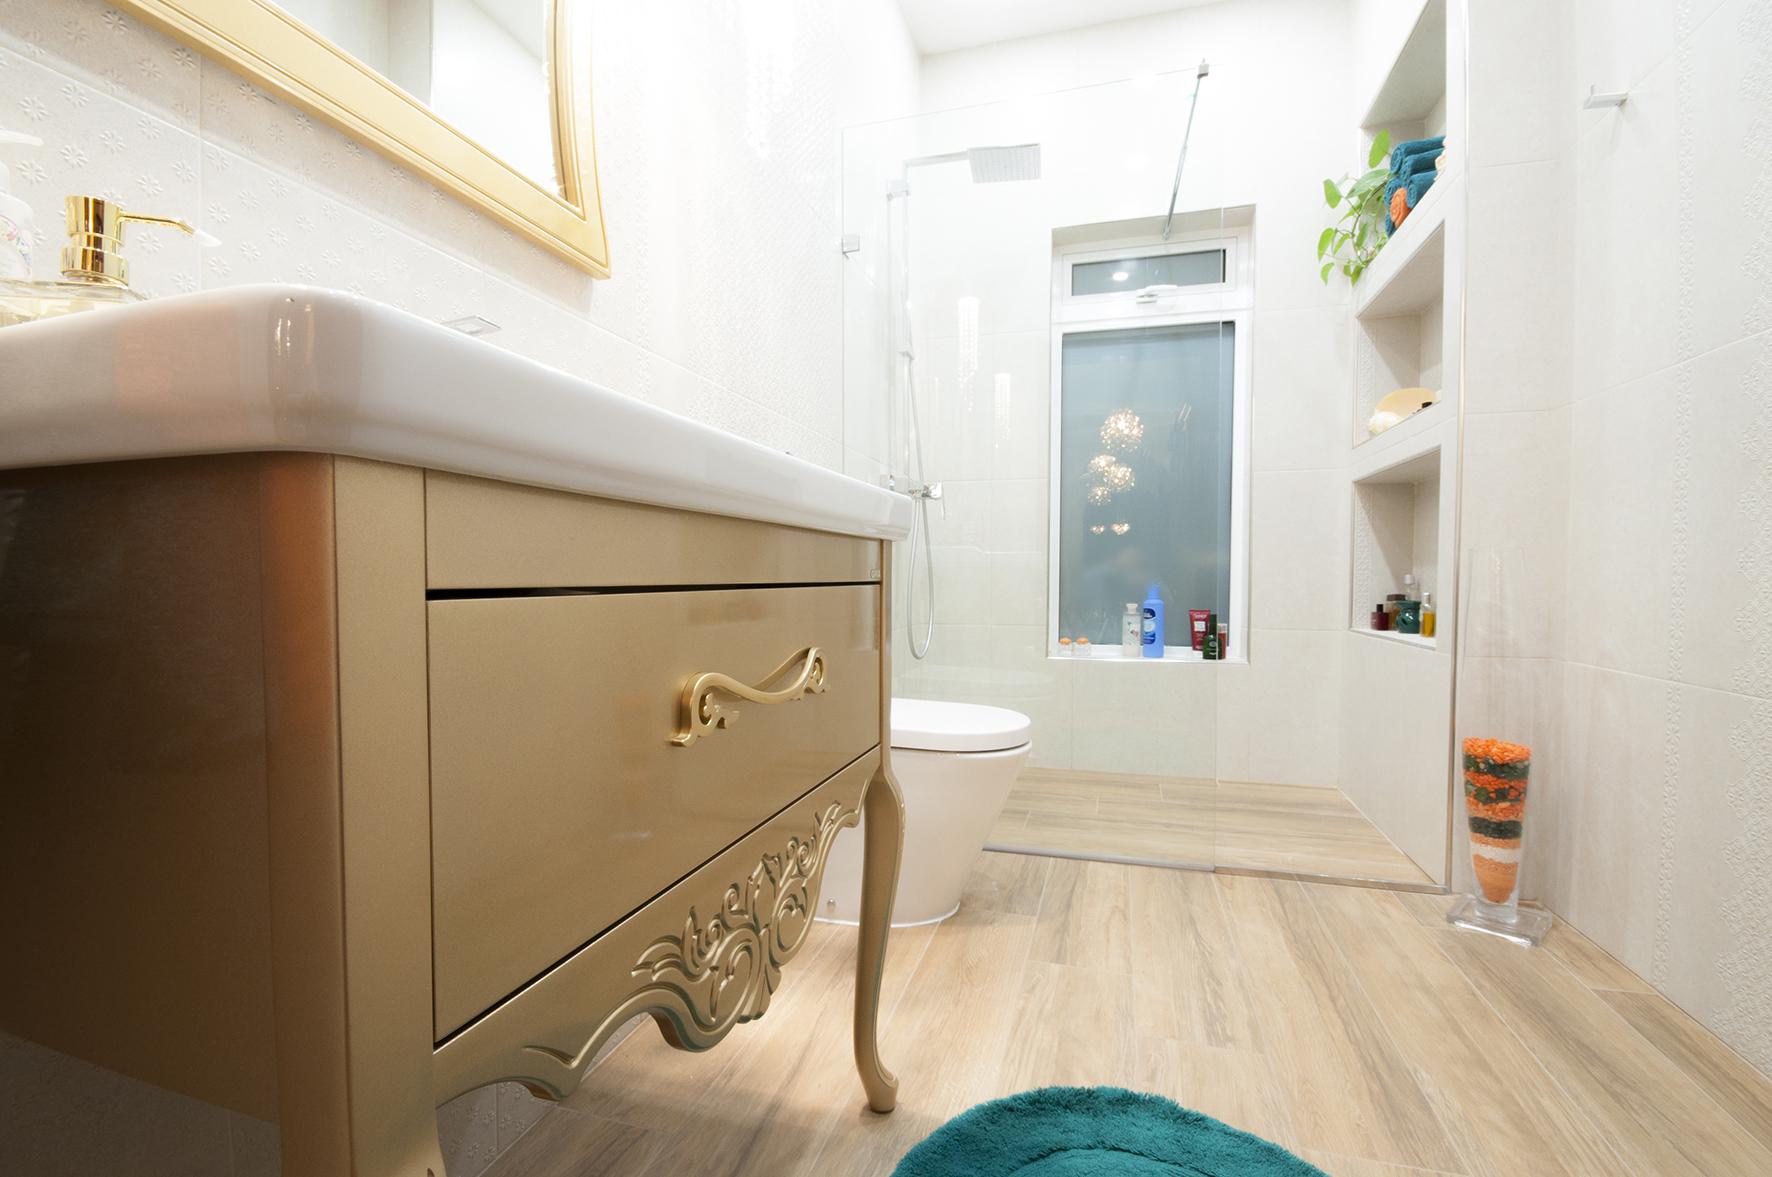 000 bathroom arabian design 2